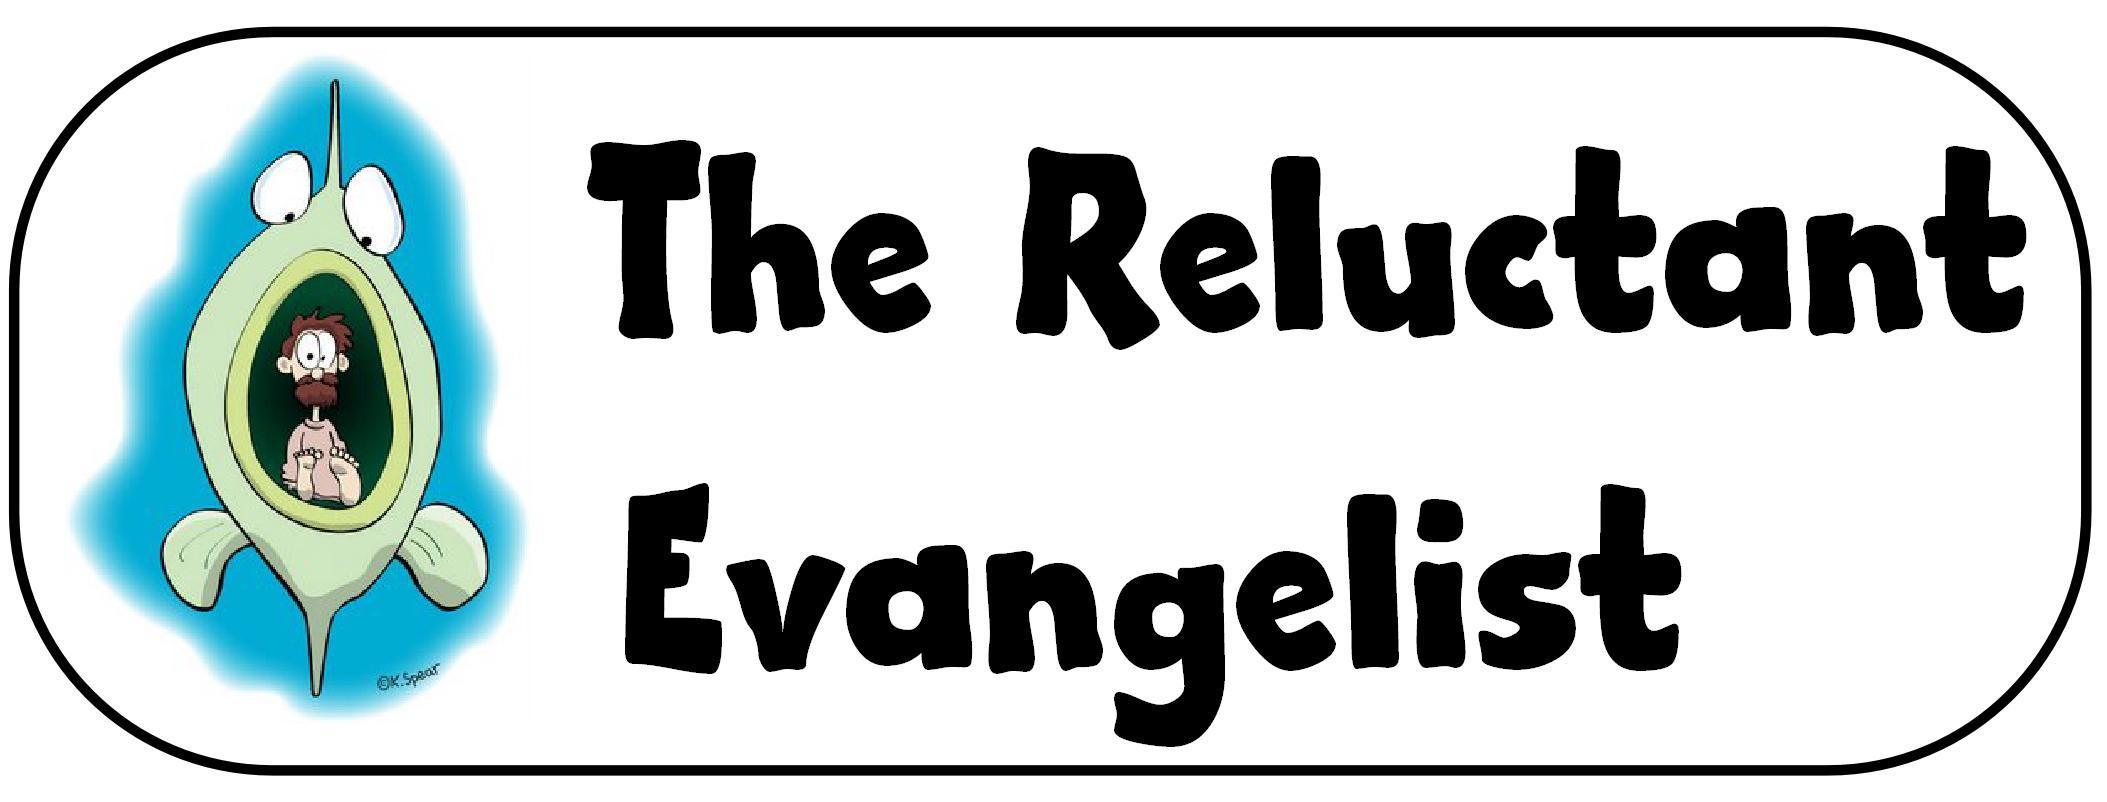 reluctant evangelist